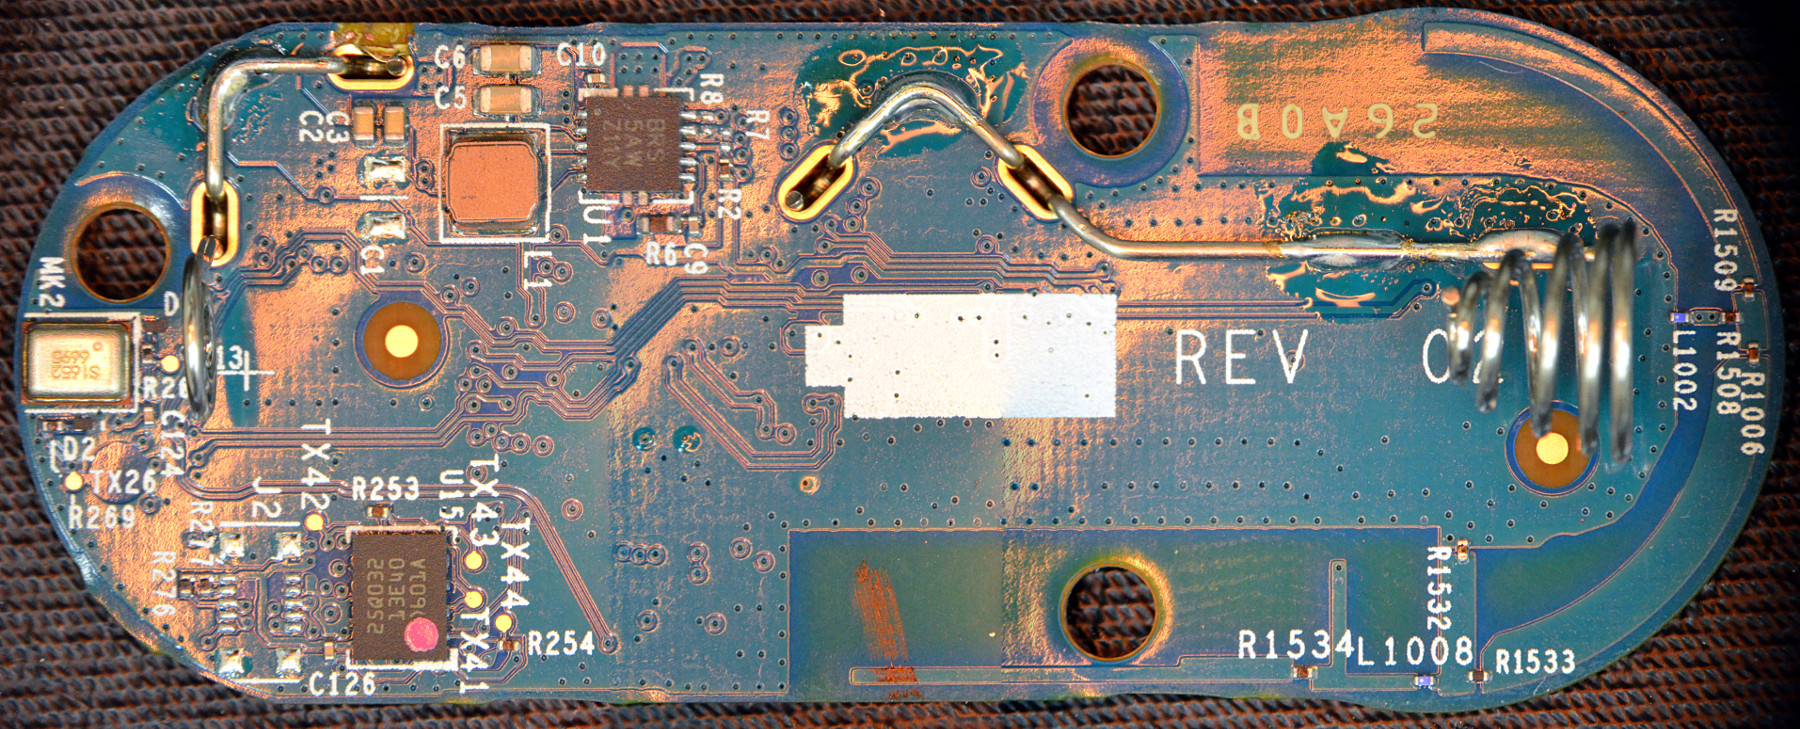 New Amazon Dash Button Teardown Jk29lp Matthew Petroff Posts With Printed Circuit Boards Label Back Of Pcb